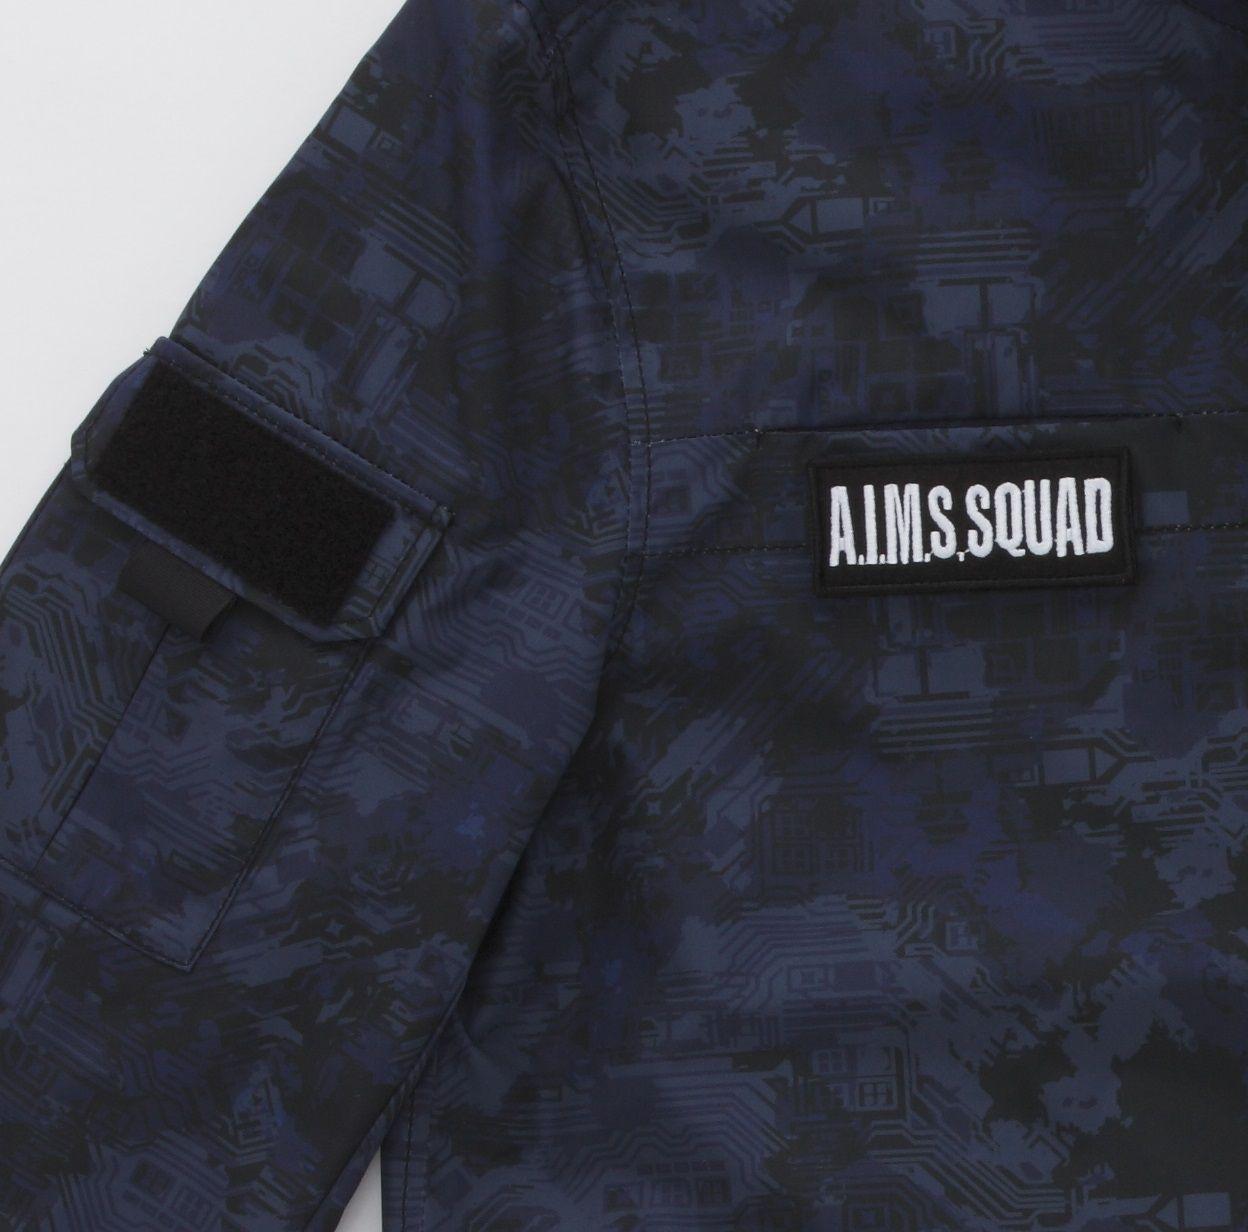 A.I.M.S. SQUAD Jacket—Kamen Rider Zero-One